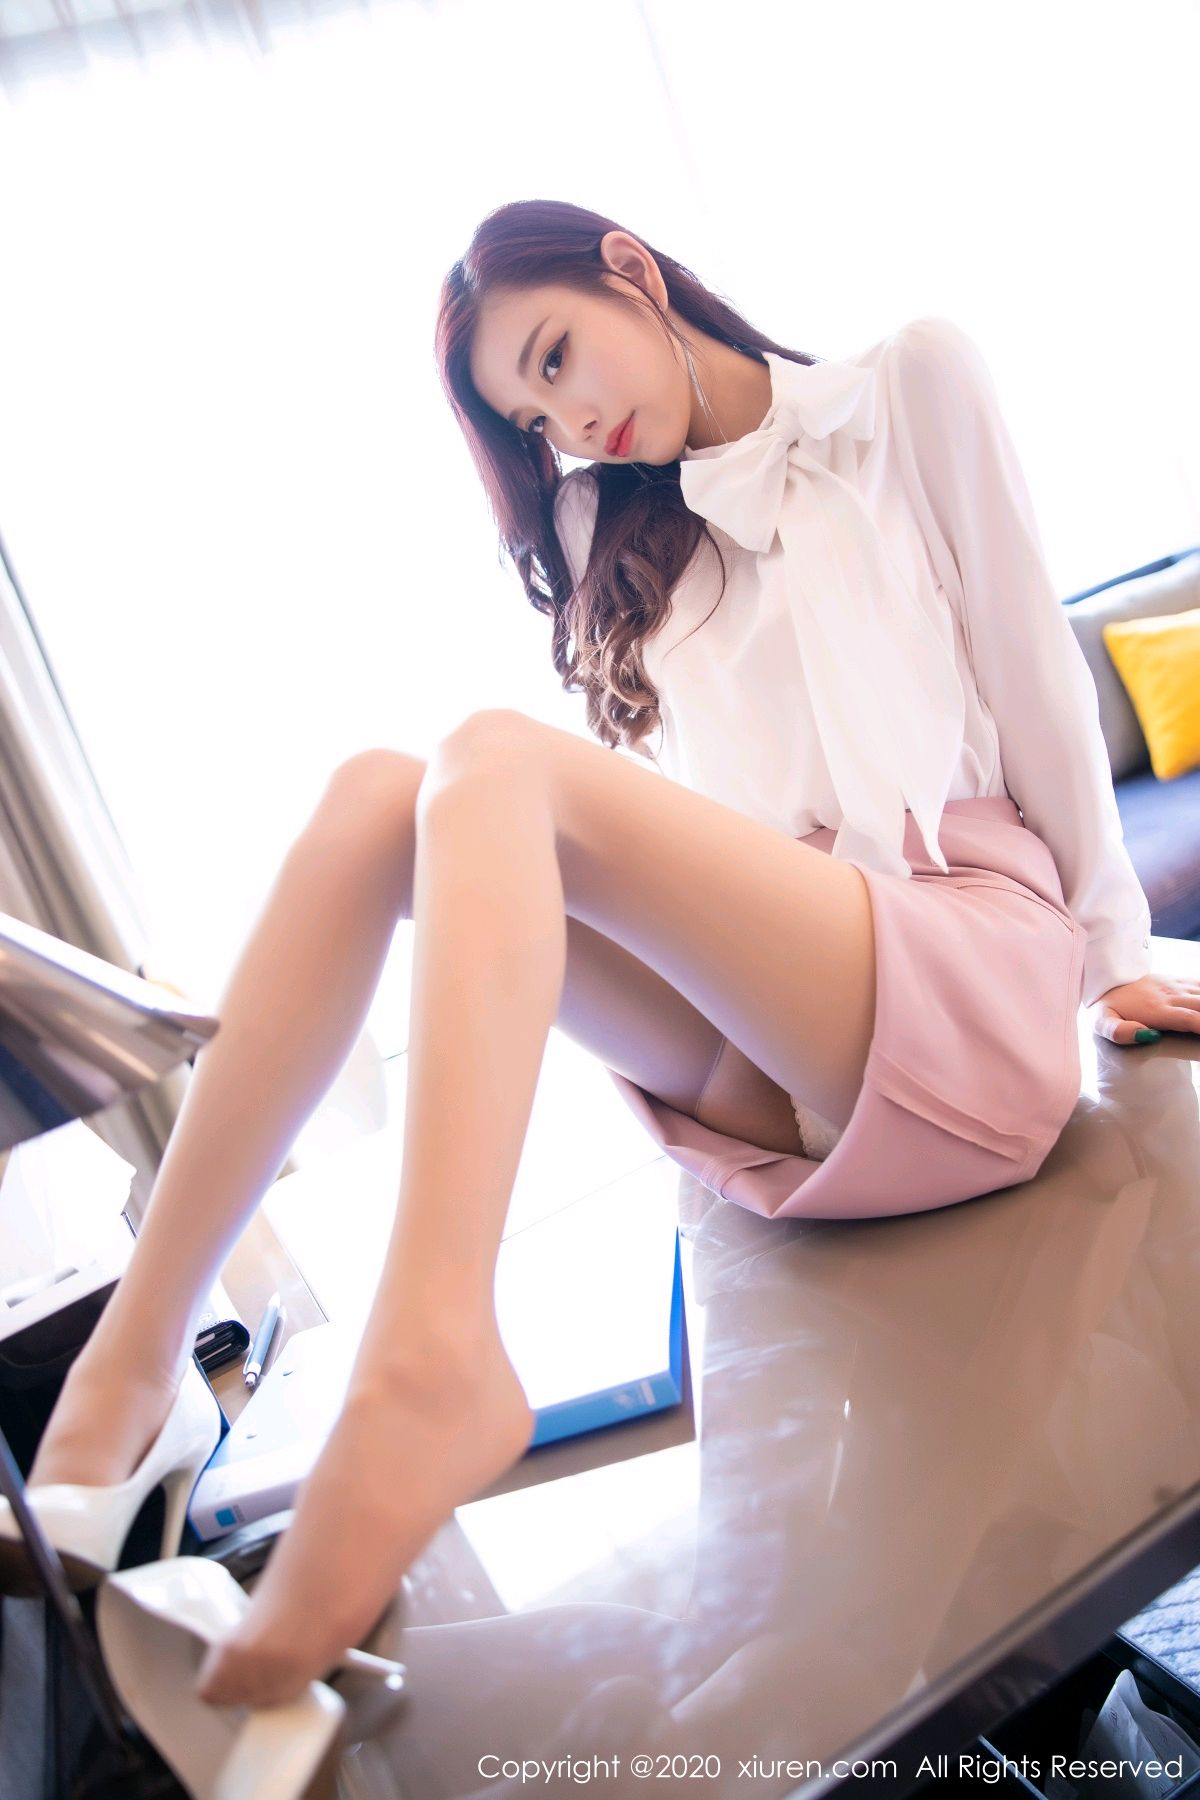 [XiuRen] Vol.2431 Yang Chen Chen 38P, Tall, Underwear, Uniform, Xiuren, Yang Chen Chen